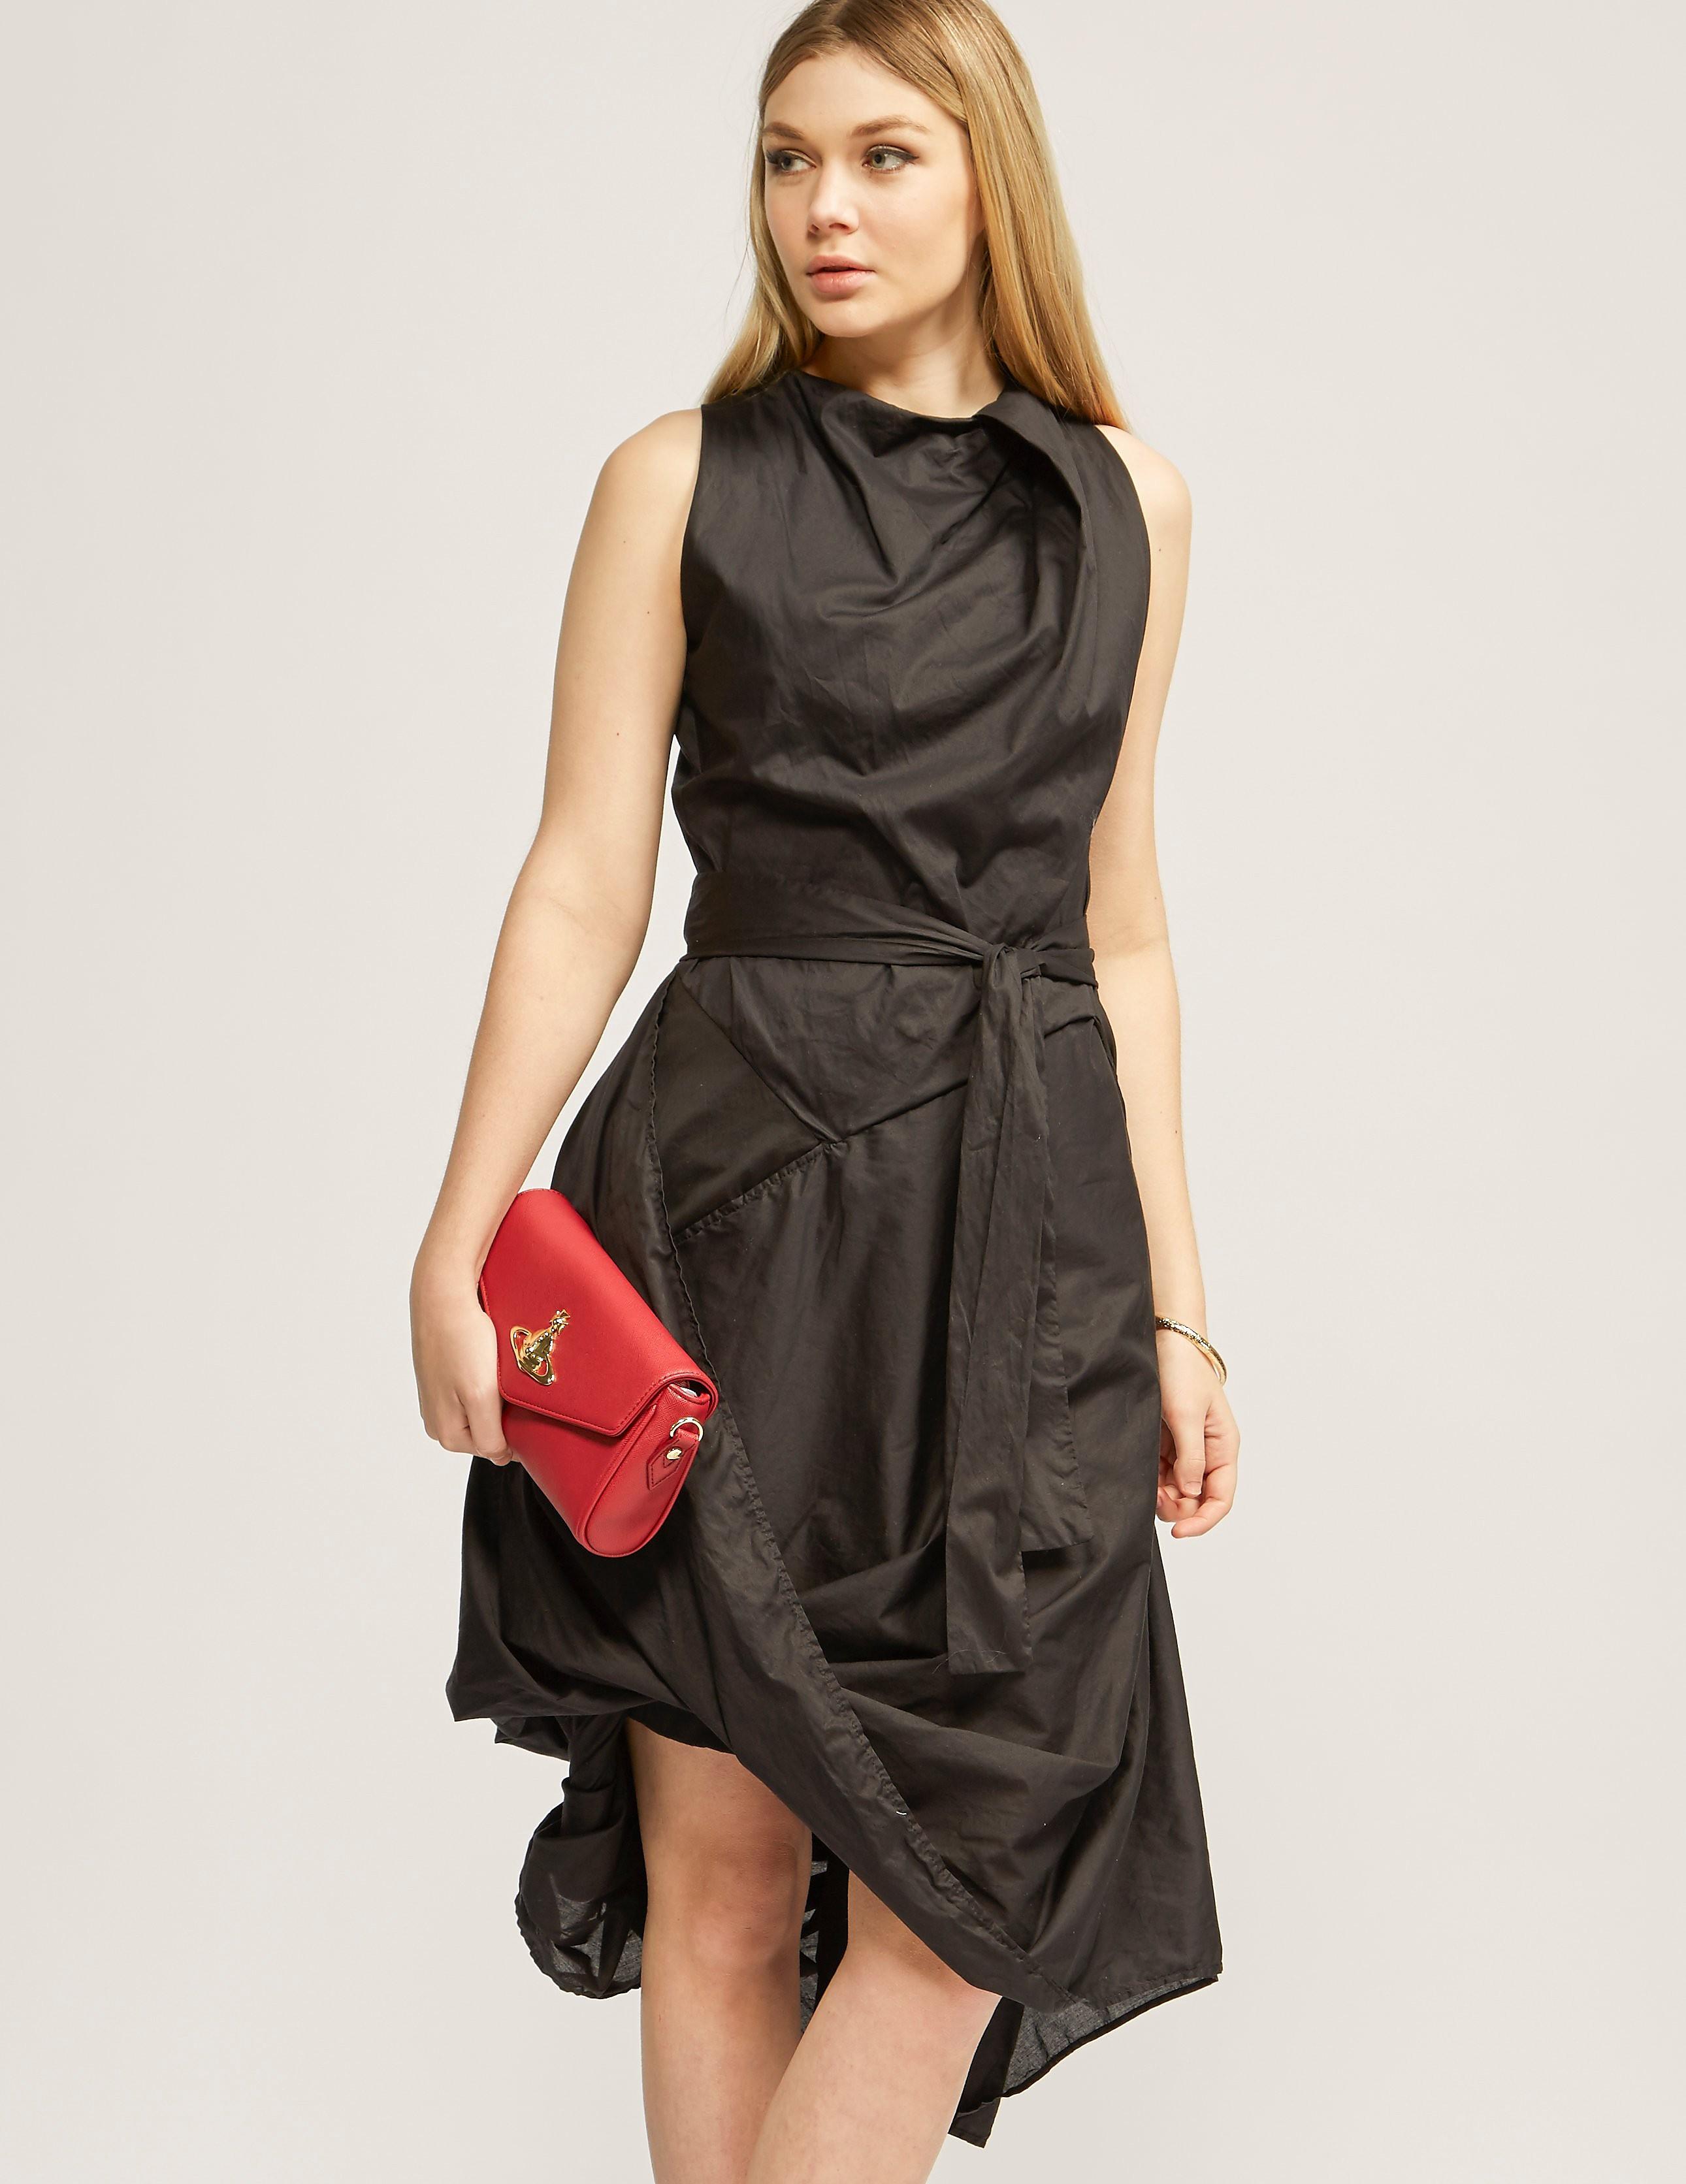 Vivienne Westwood Eight Dress